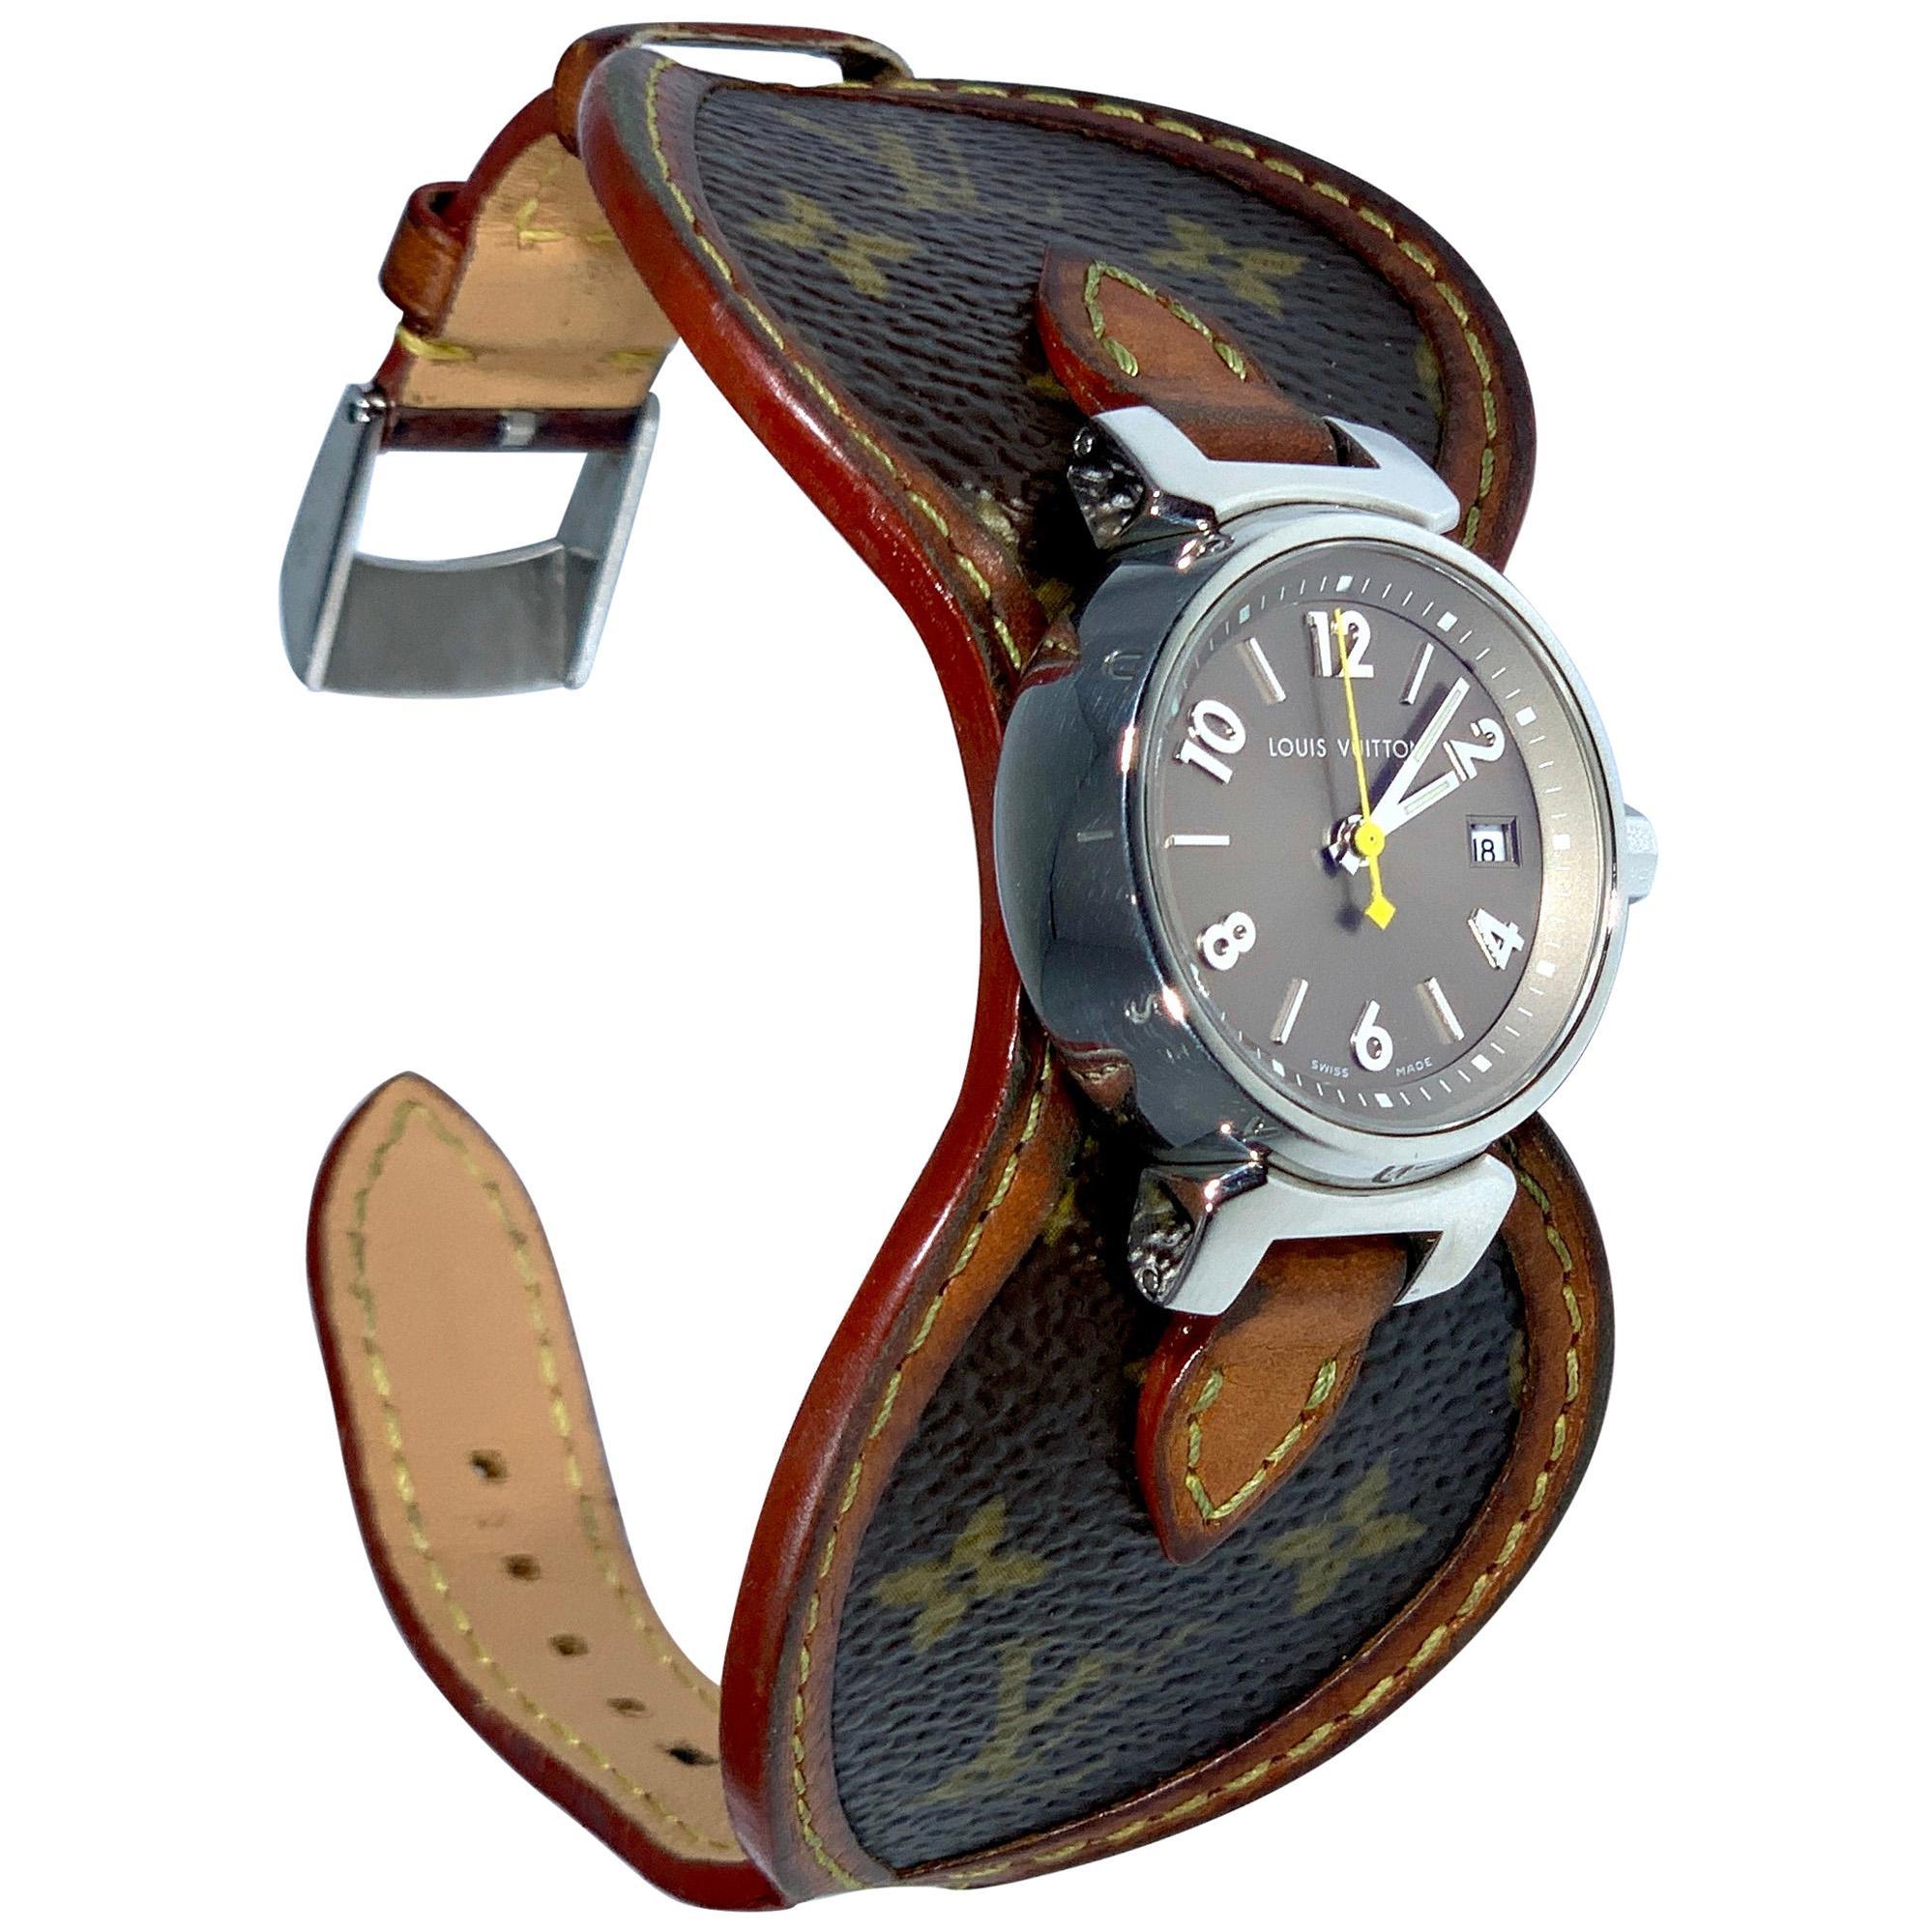 Louis Vuitton Tambour Q1212 Quartz Ladies Watch, Louis Vuitton Monogram Leather